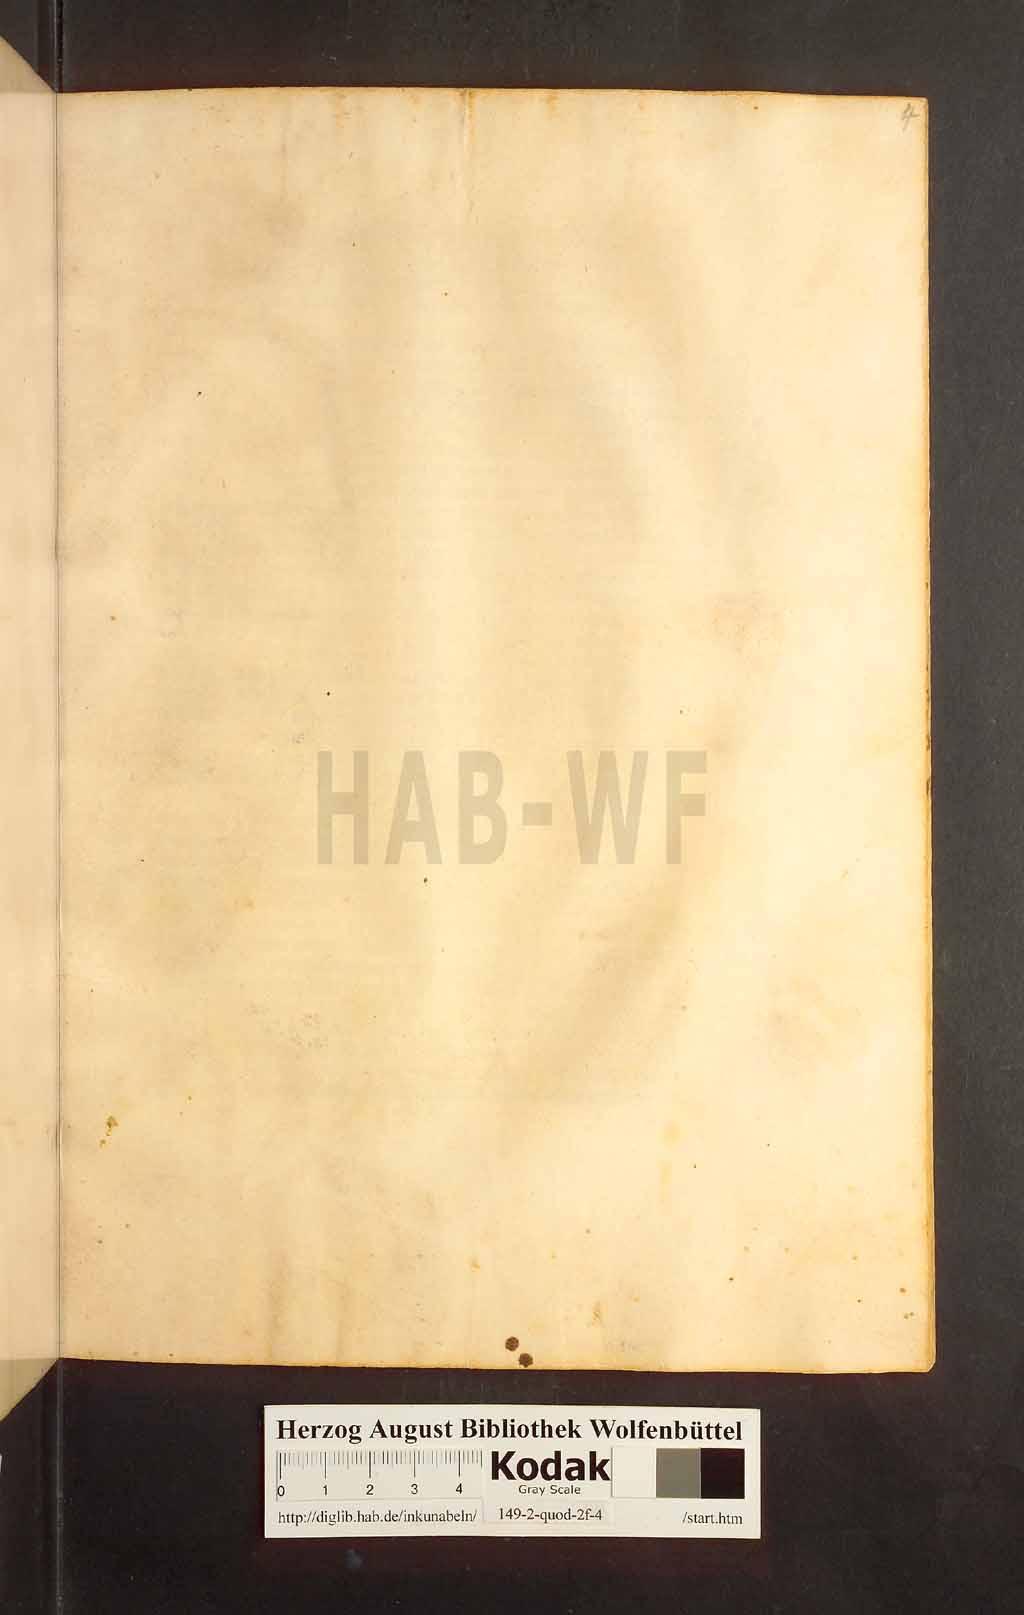 http://diglib.hab.de/inkunabeln/149-2-quod-2f-4/00001.jpg